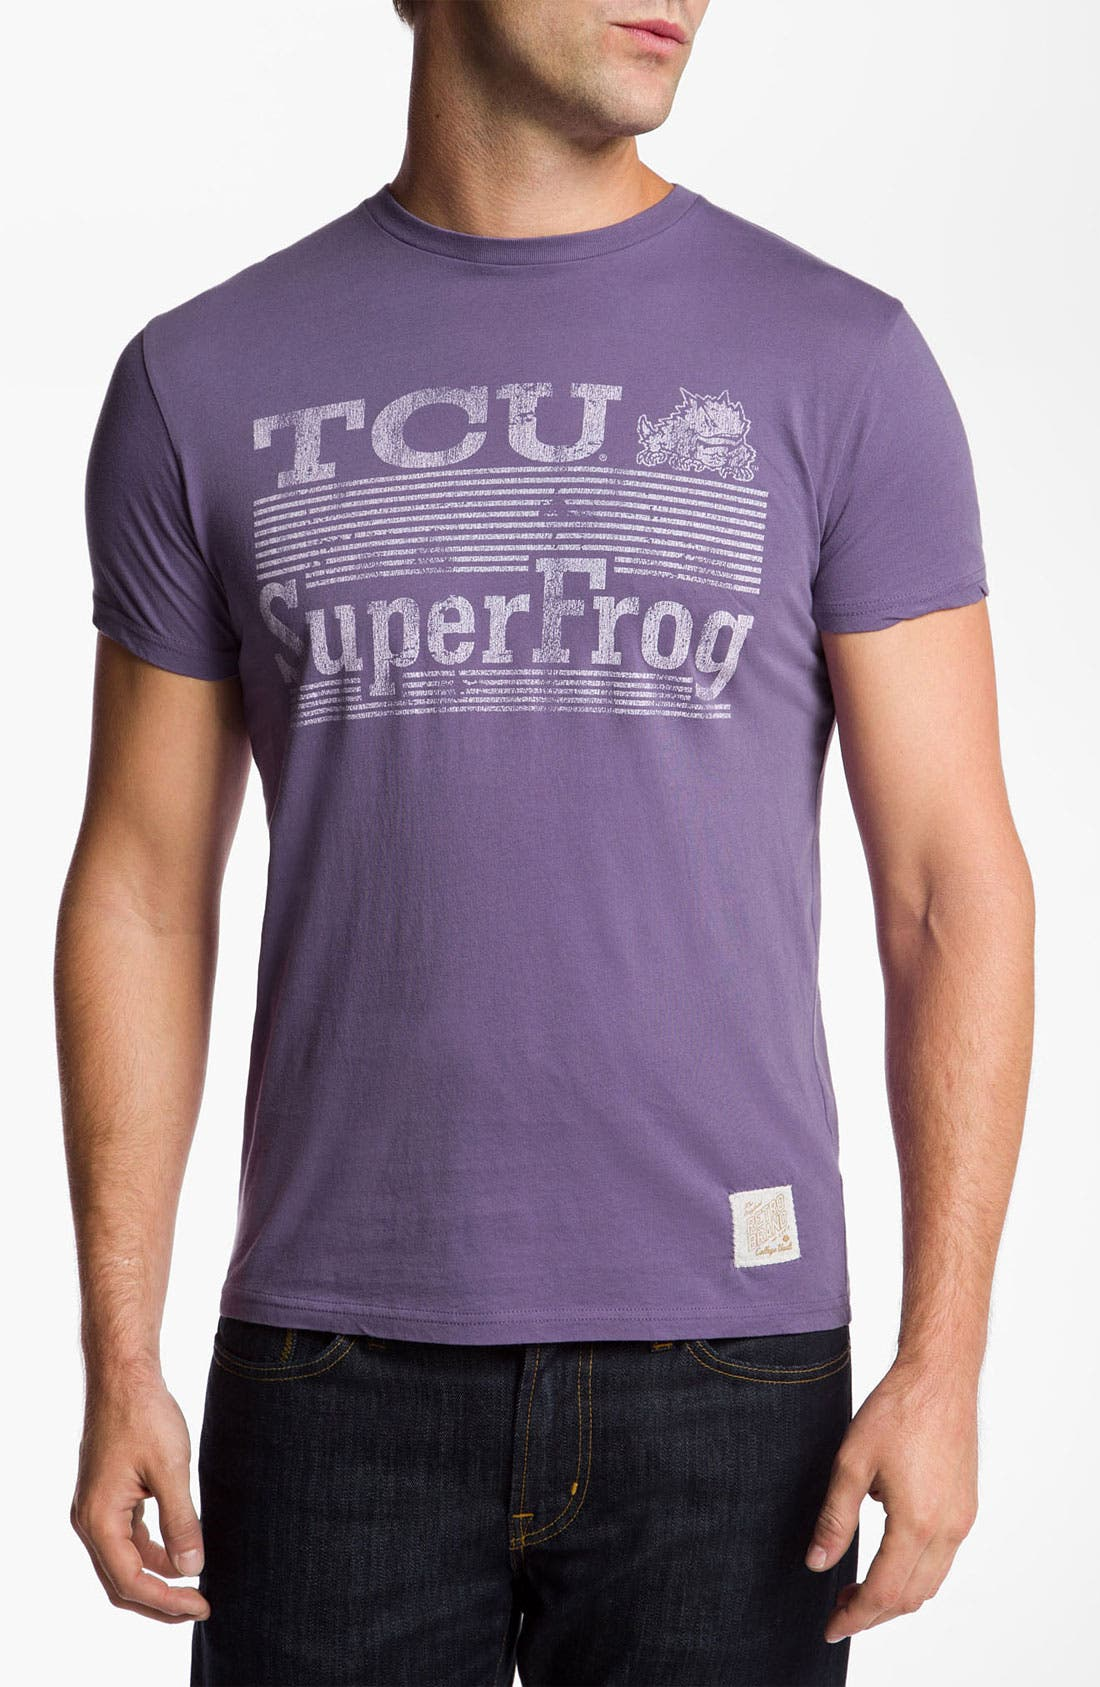 Alternate Image 1 Selected - The Original Retro Brand 'TCU Horned Frogs - Superfrog' T-Shirt